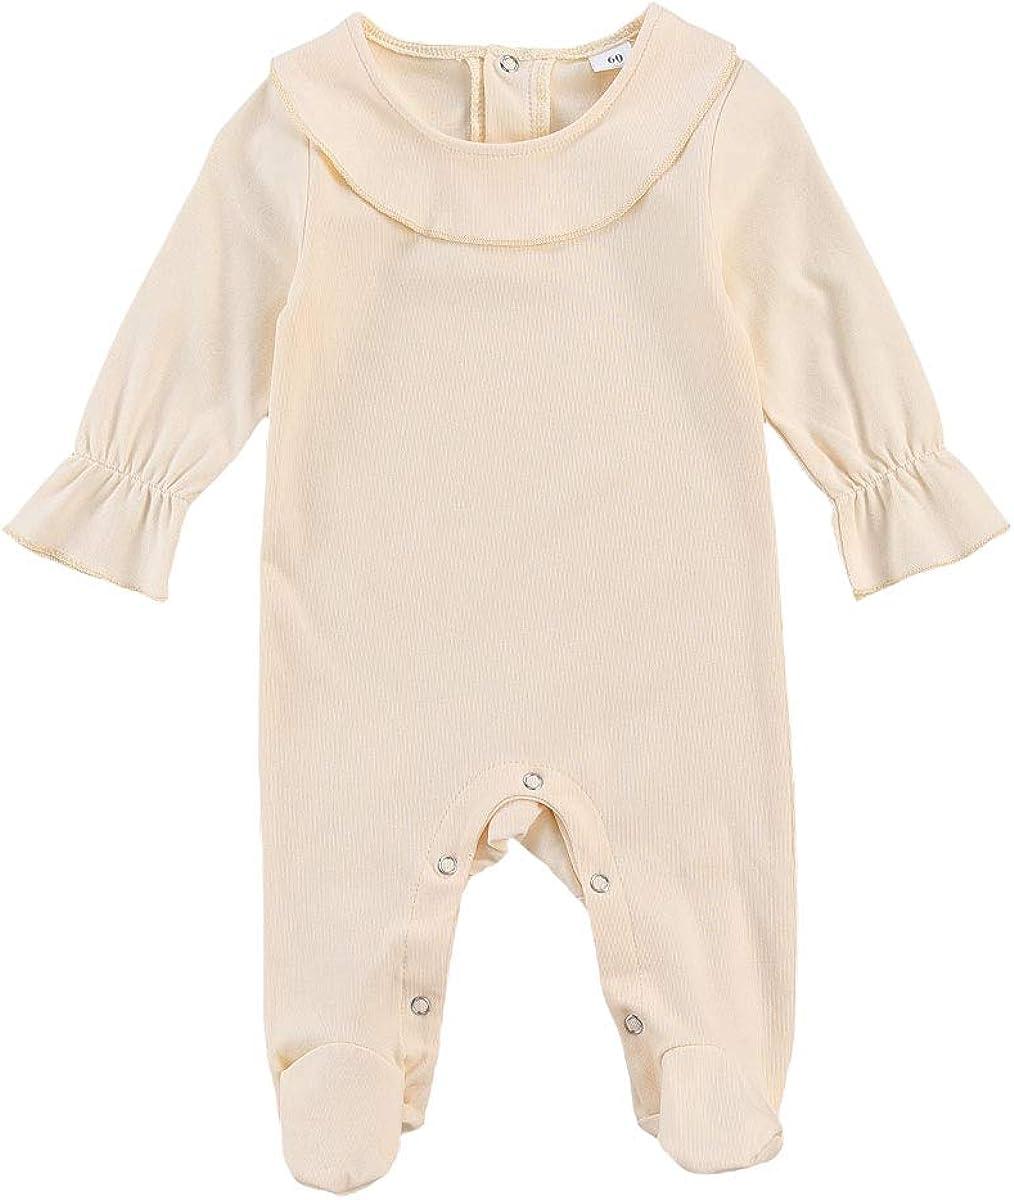 GanCheng Babys Black Romper for Baby Girl Geek Bodysuit Happy Thanksgiving Onesies